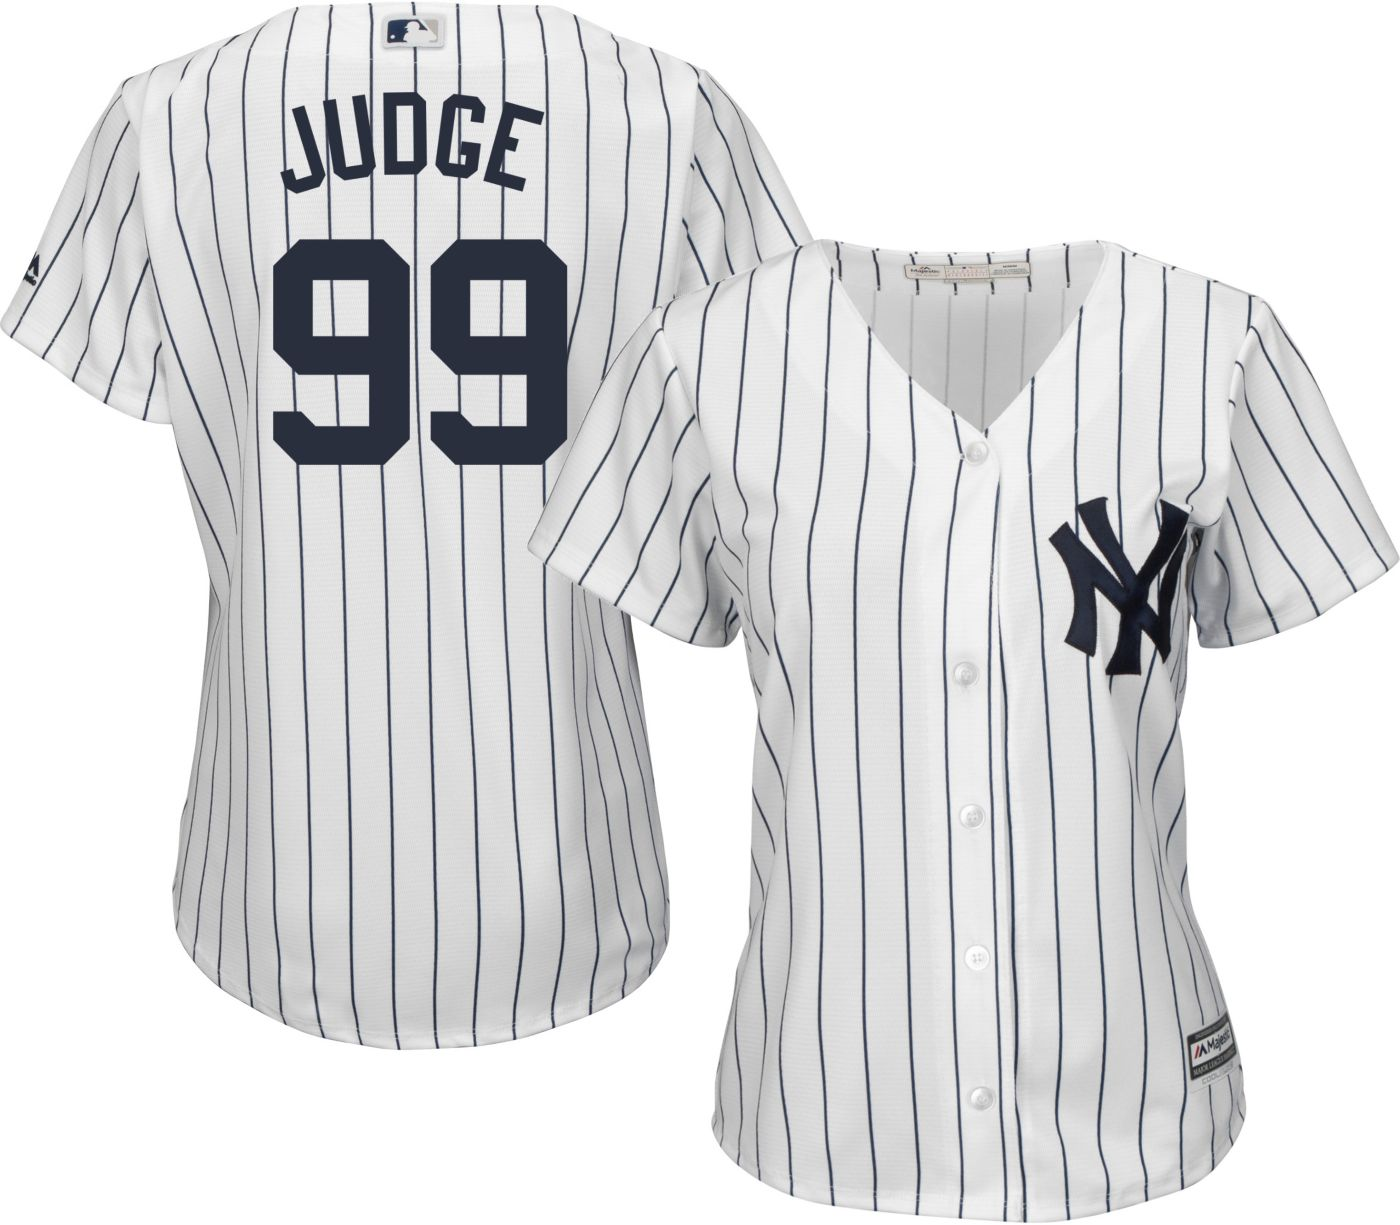 Majestic Women's Replica New York Yankees Aaron Judge #99 Cool Base Home White Jersey